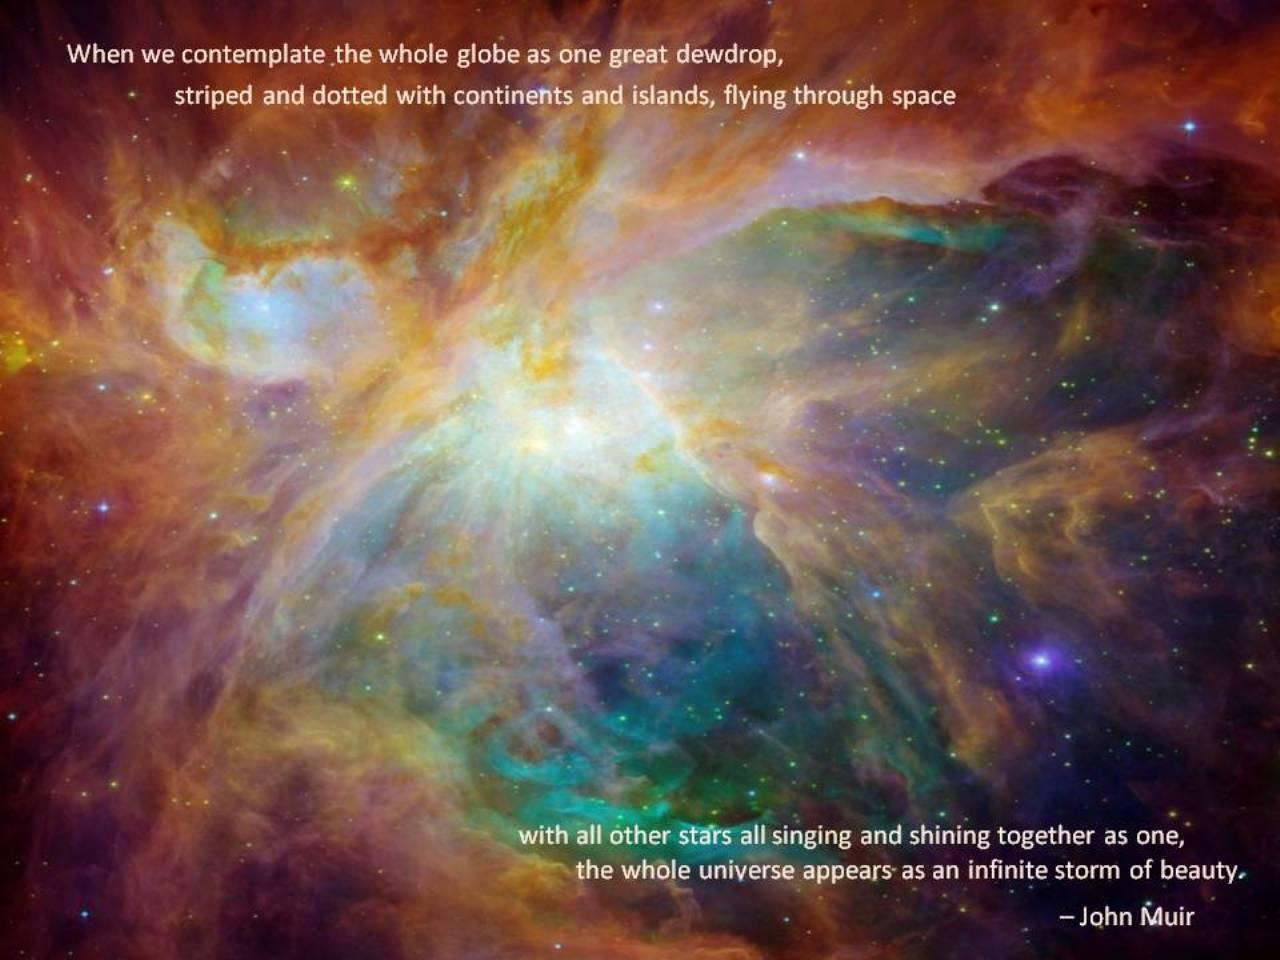 Hubble wallpapers and screensavers wallpapersafari - Spitzer space telescope wallpaper ...